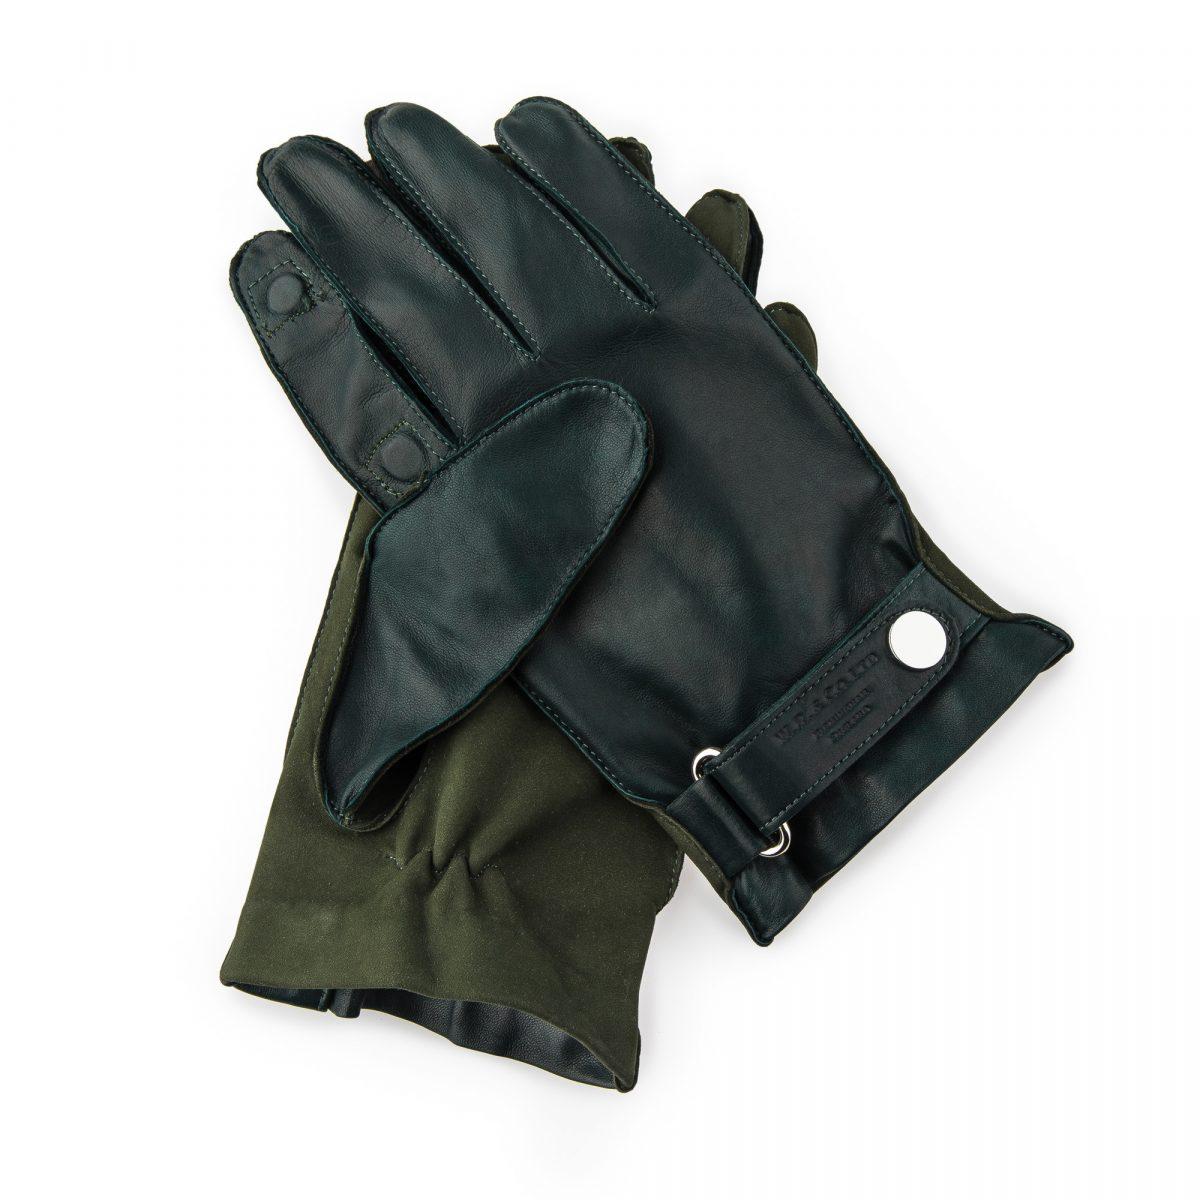 wr_co_premium_shooting_gloves-149-edit